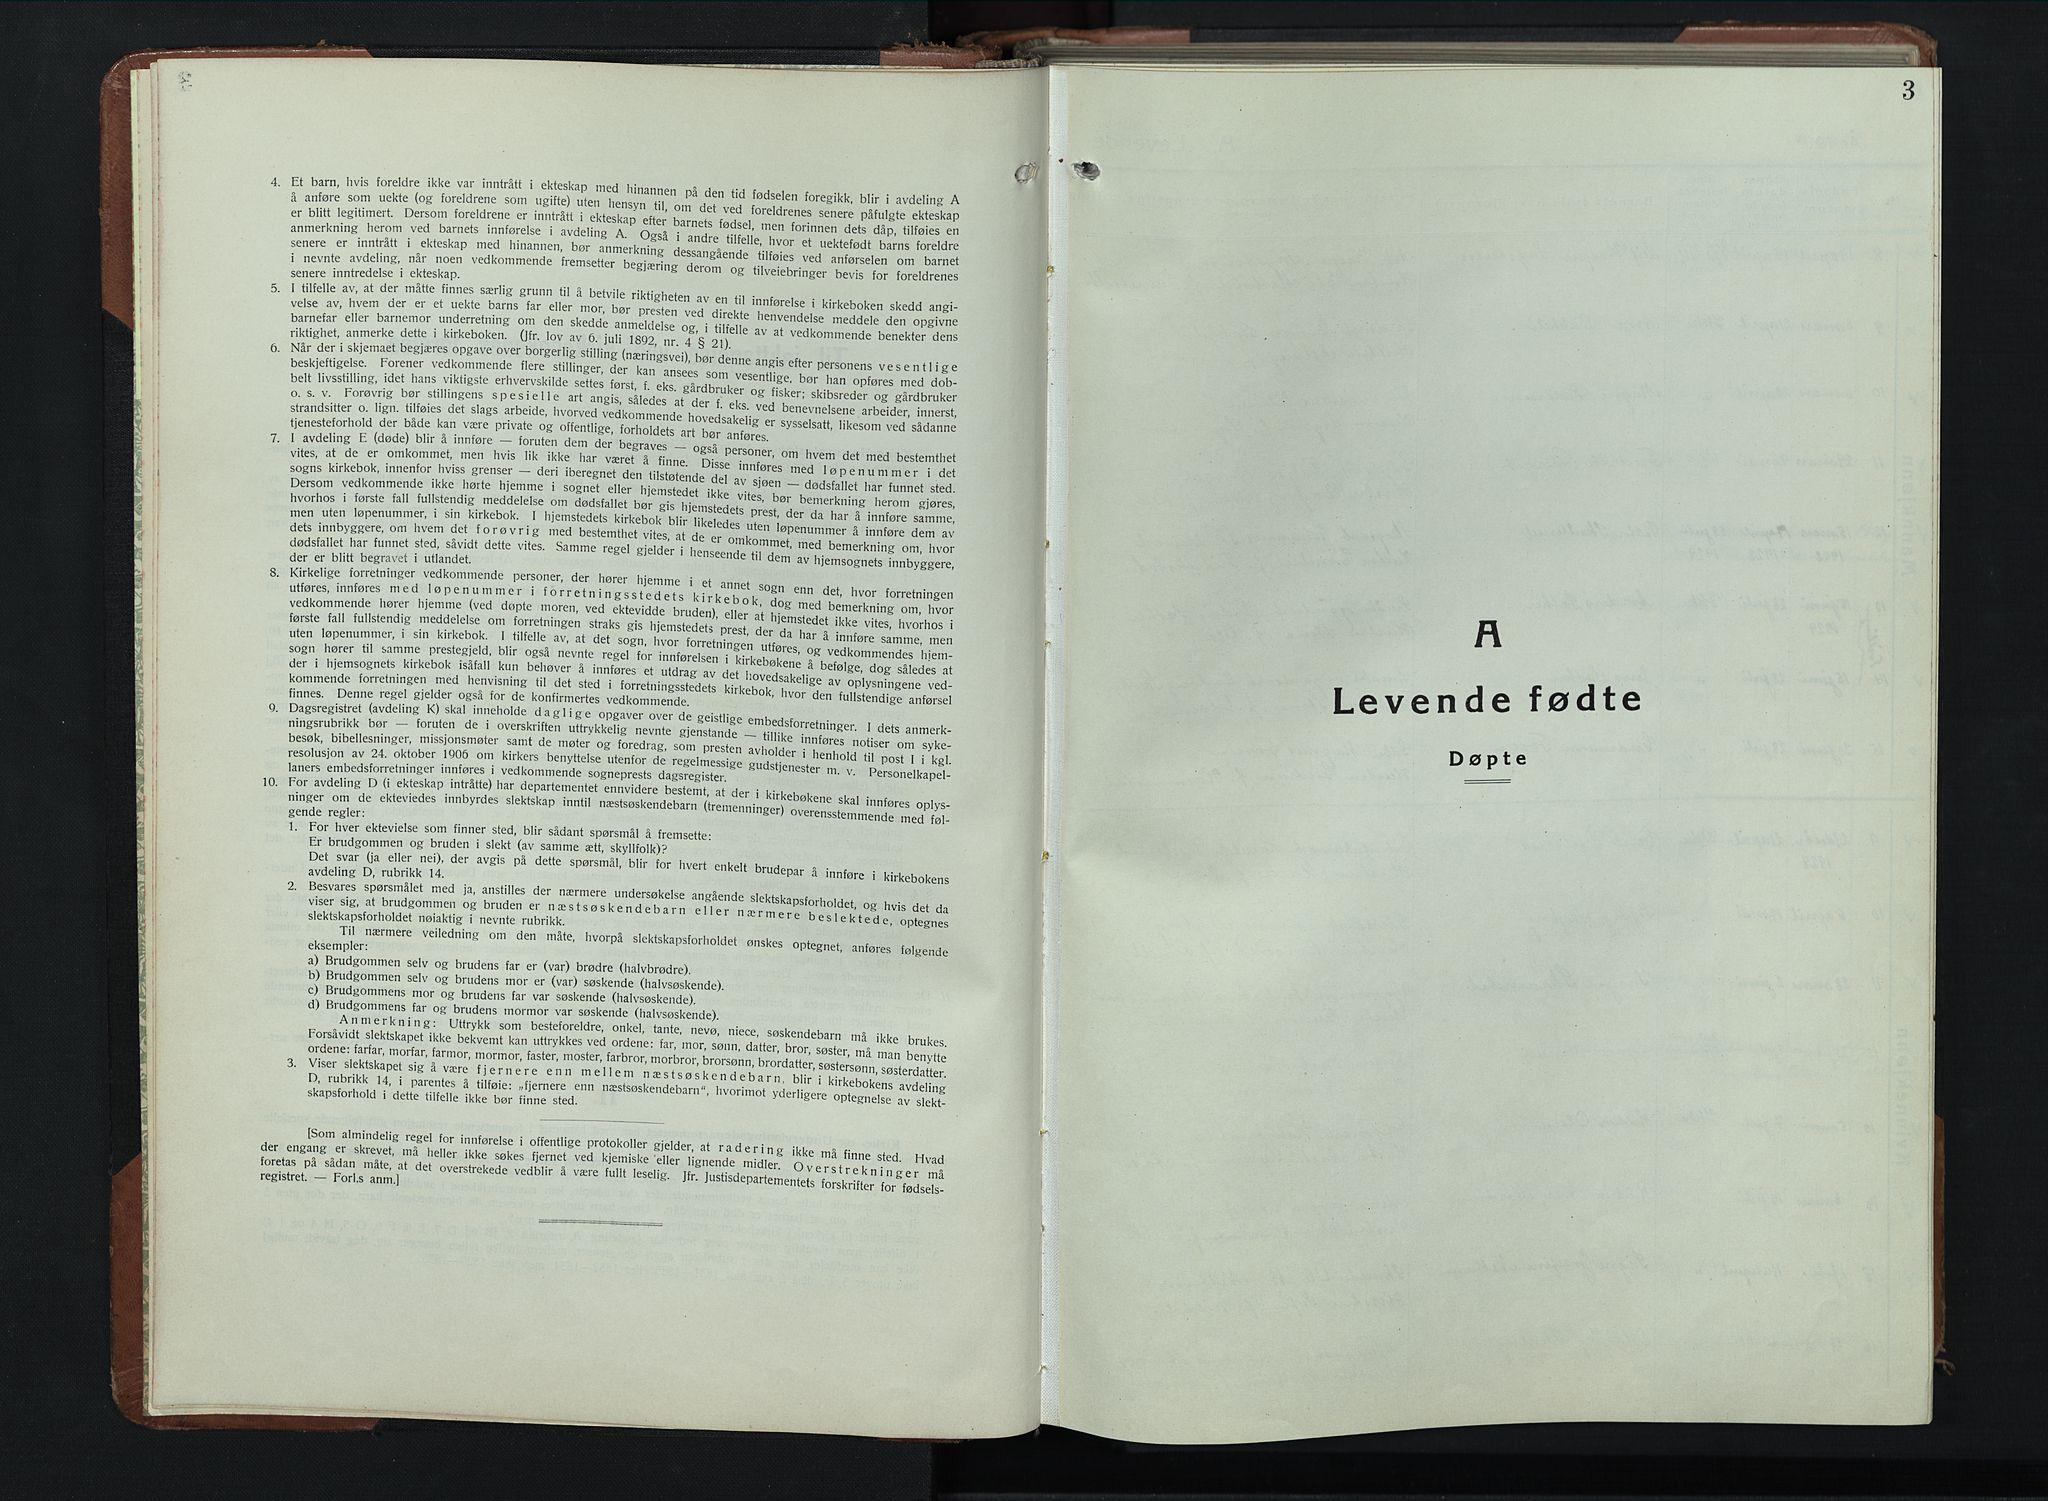 SAH, Balke prestekontor, Klokkerbok nr. 2, 1929-1951, s. 3